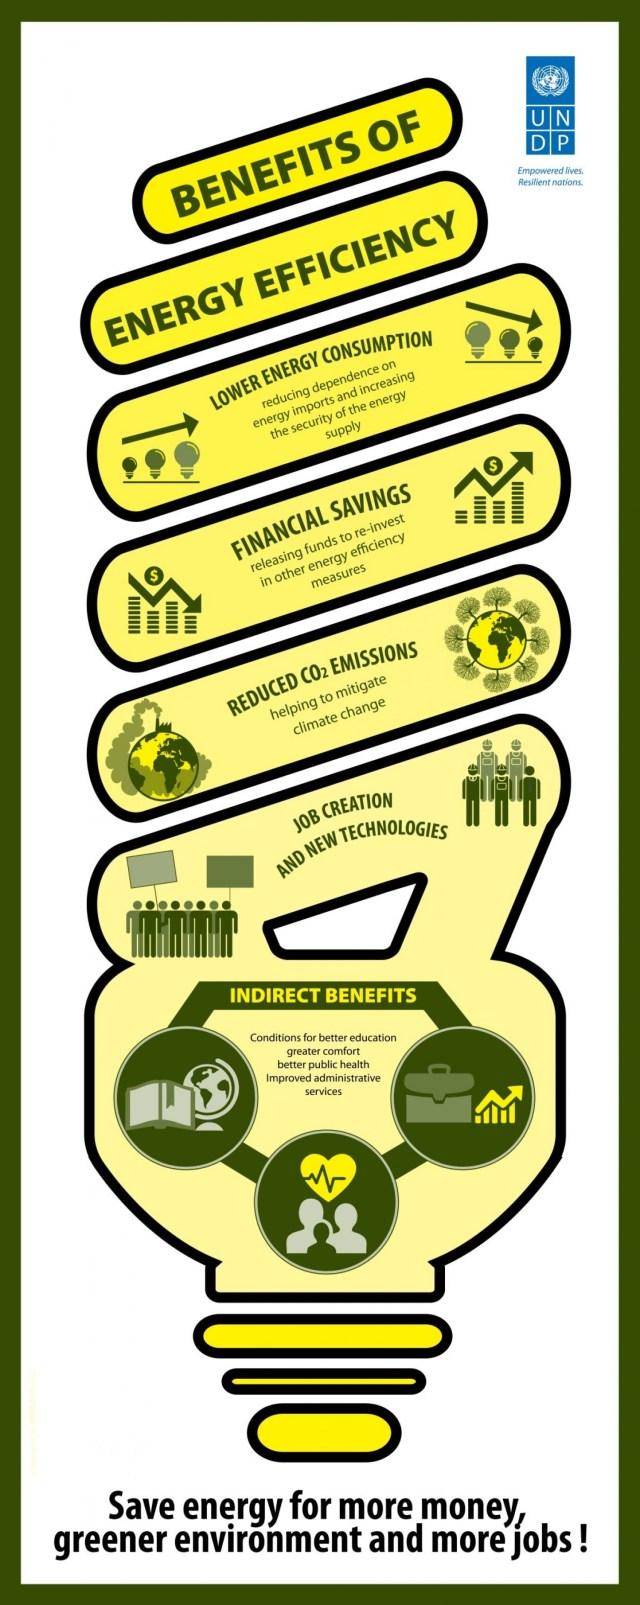 Benefits of Energy Efficiency